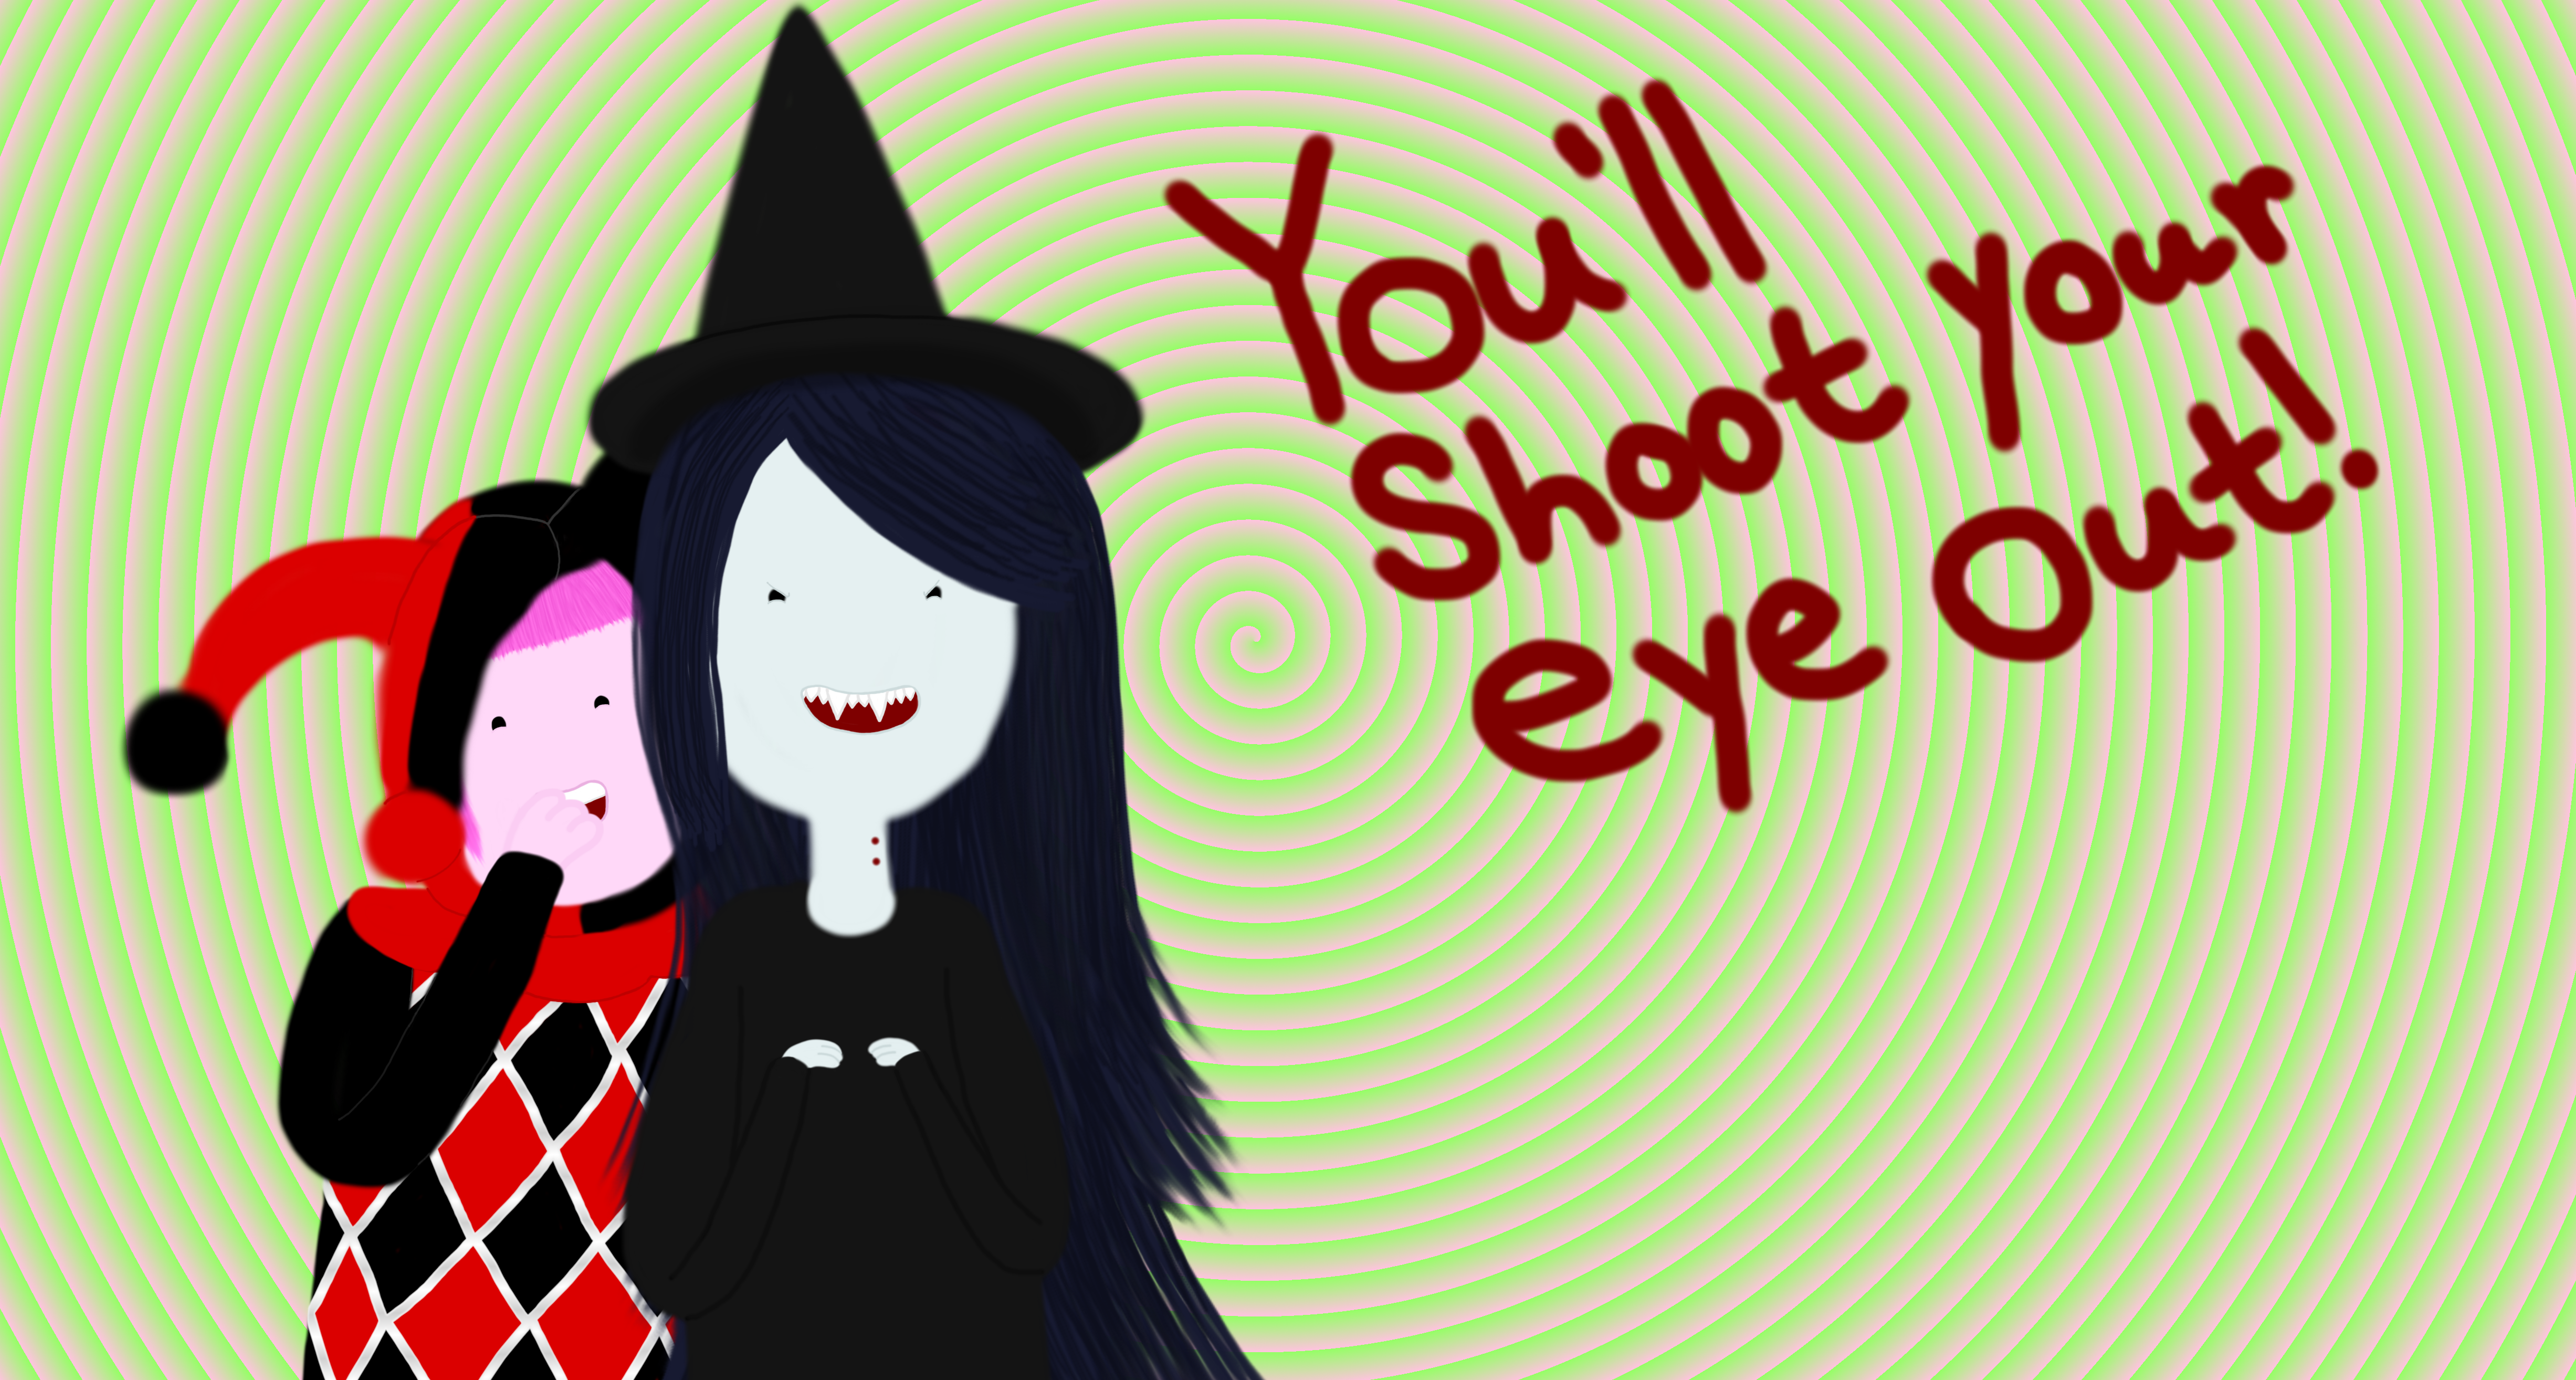 You'll Shoot Your Eye Out, Finn! By AquaSeashells On